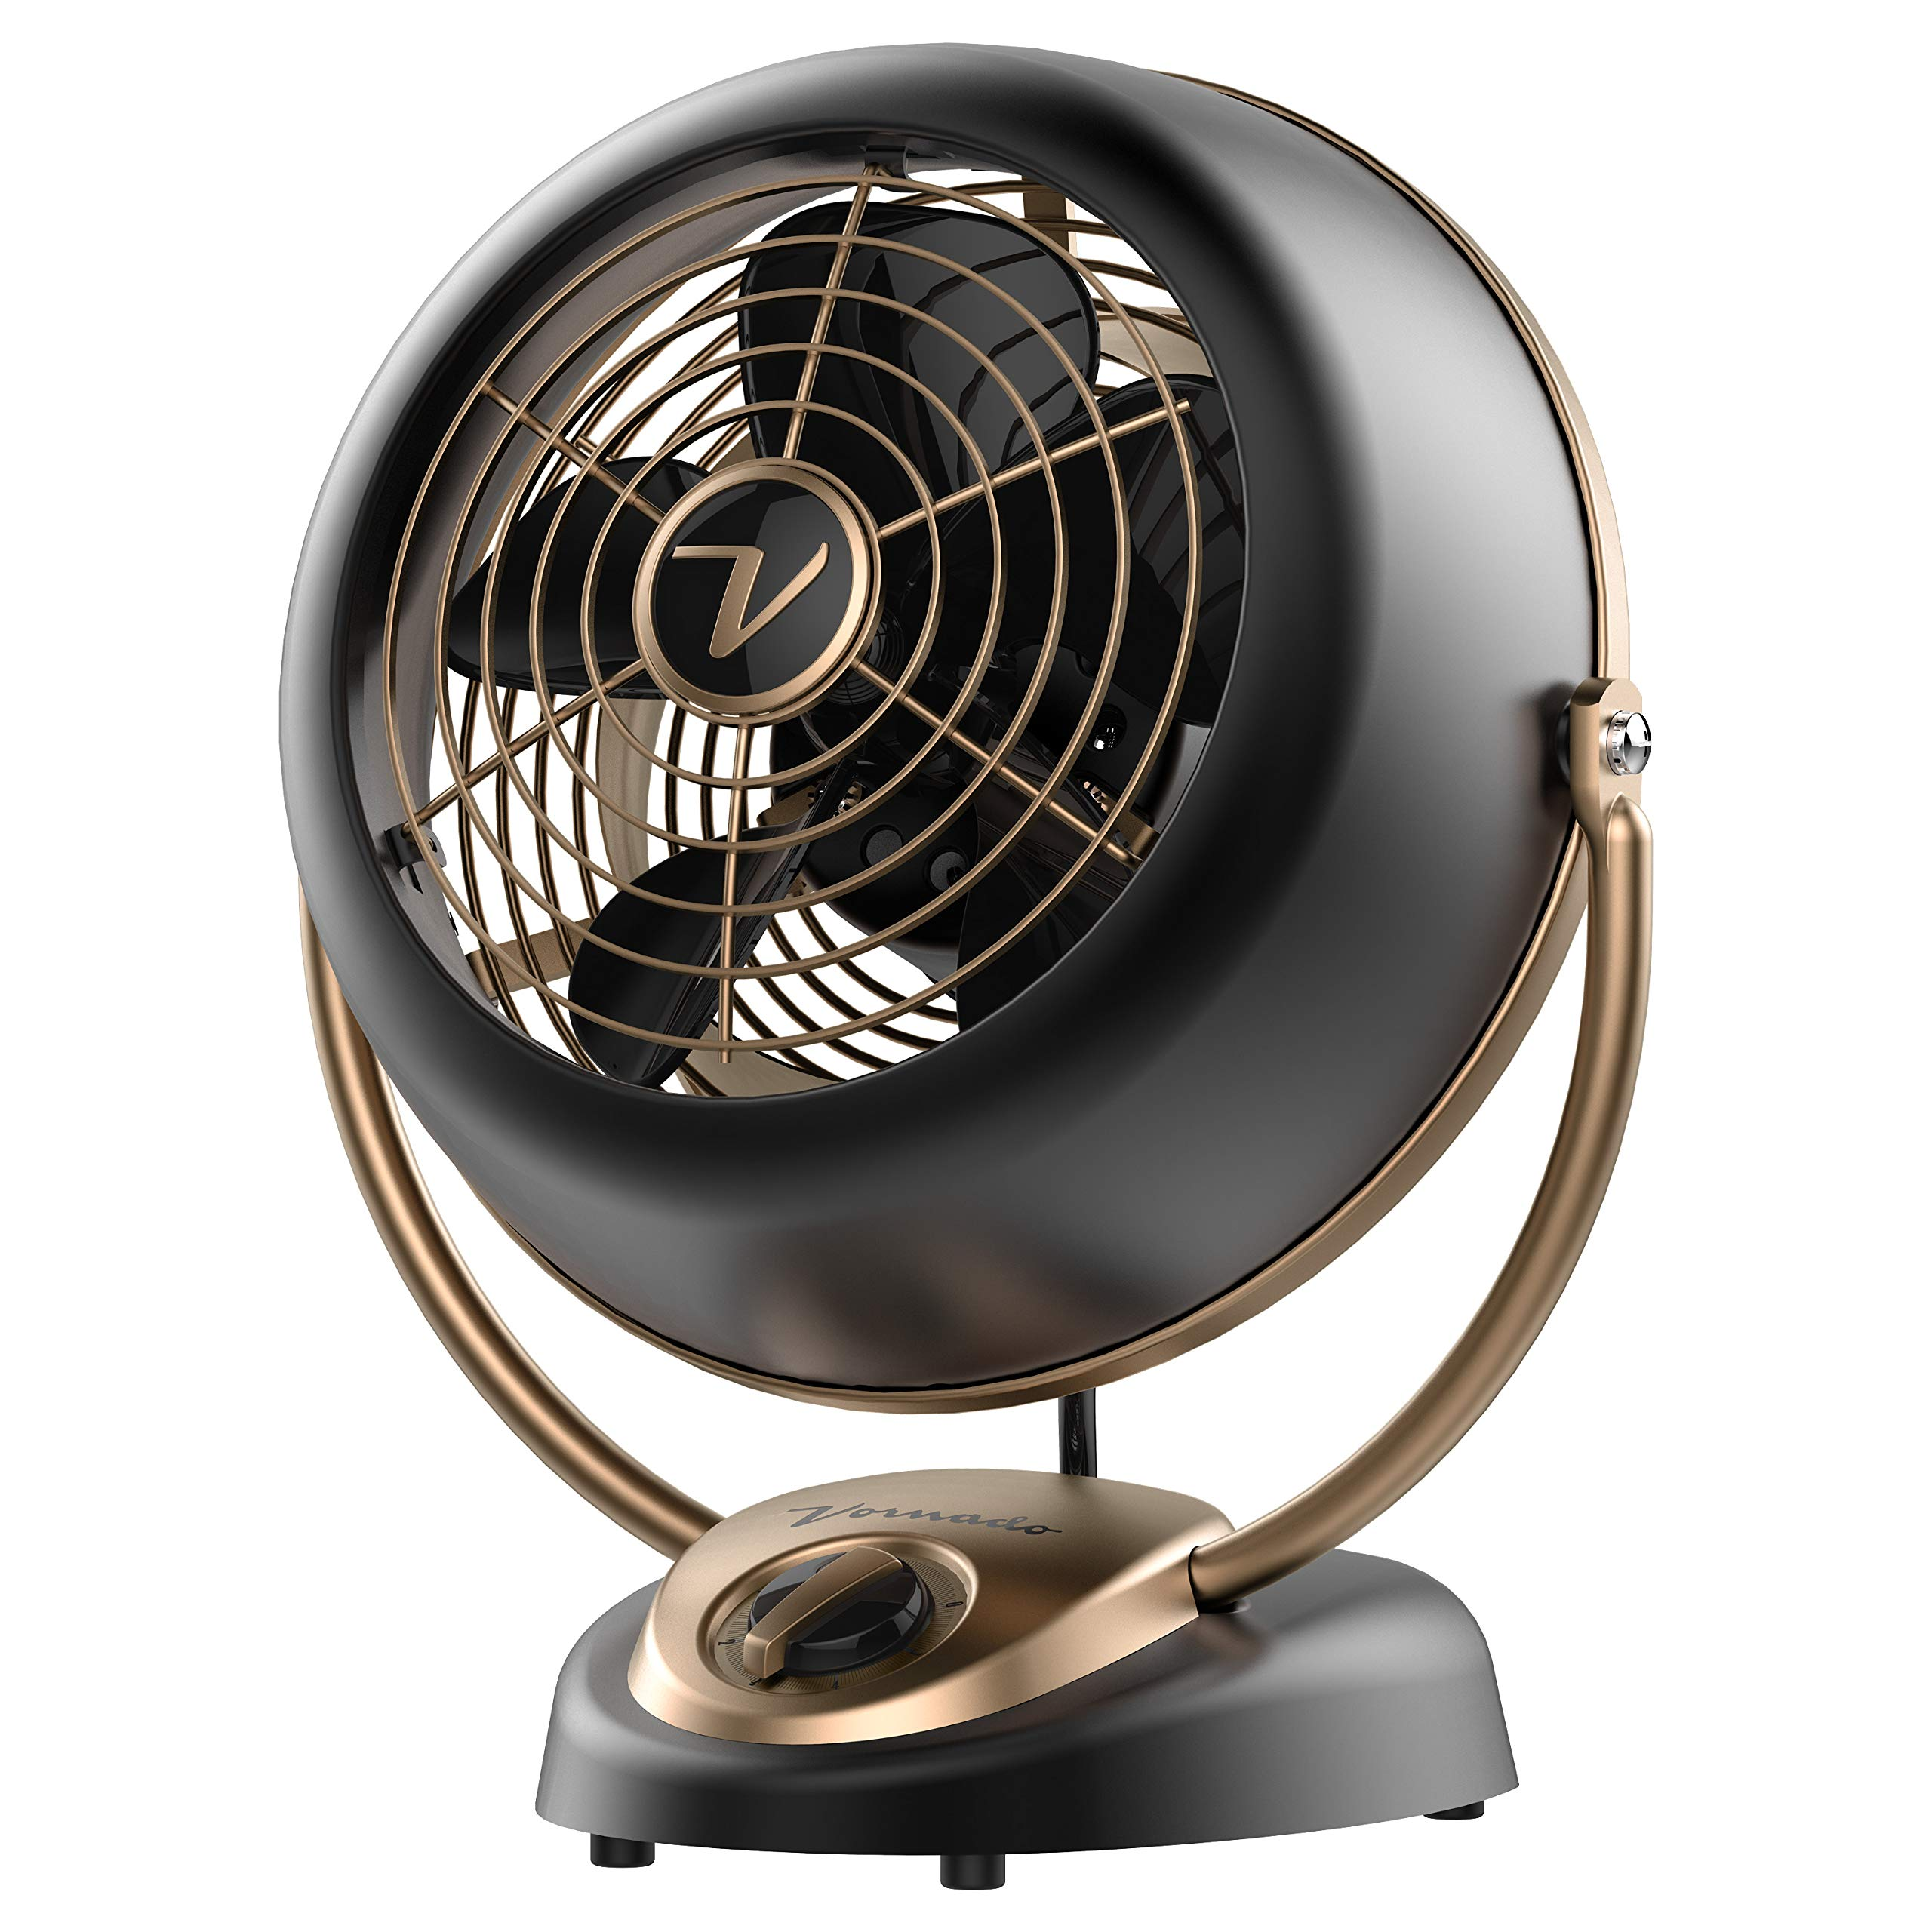 Vornado VFAN Alchemy Vintage Fan, Gunmetal by Vornado